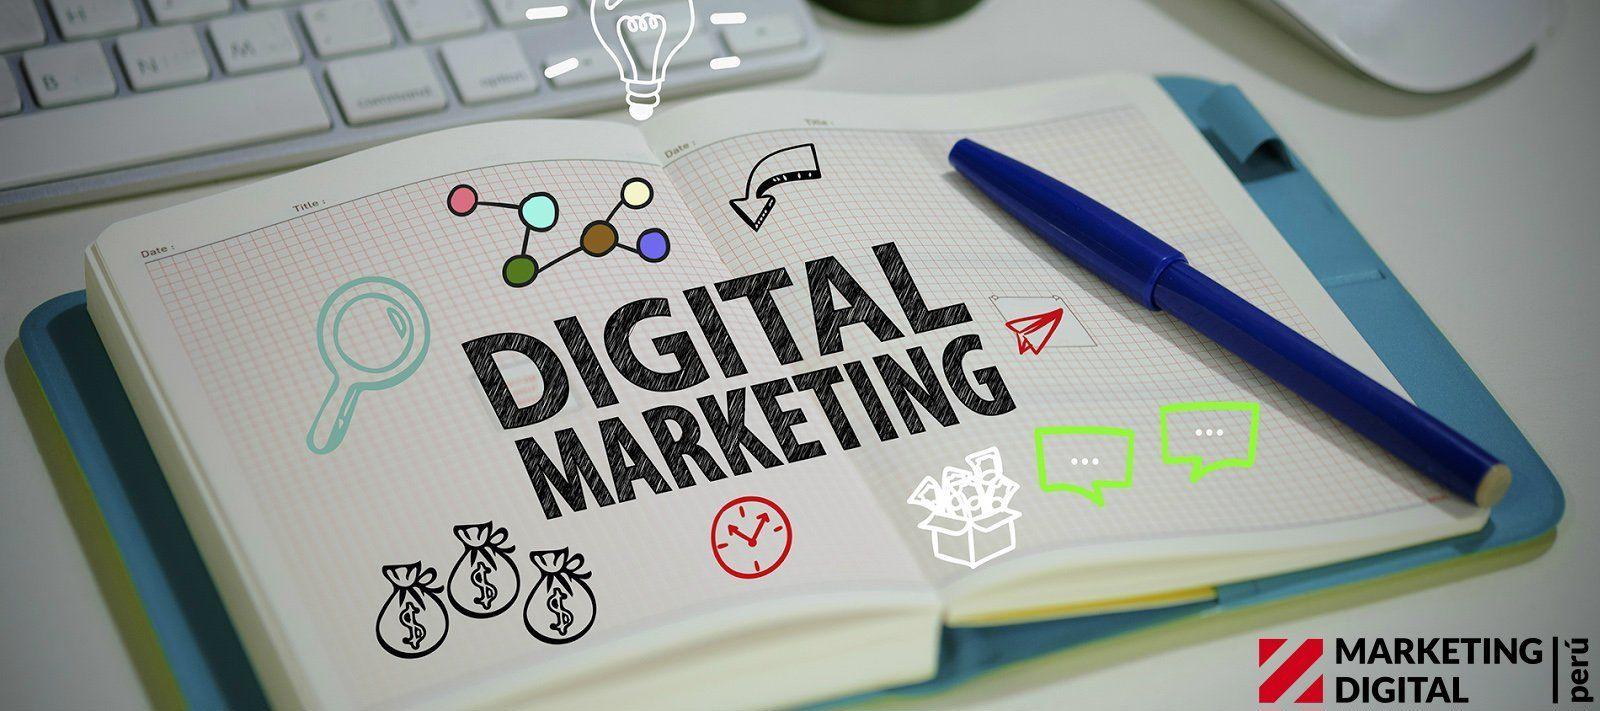 marketingdigitalpec3ba-digital-marketing